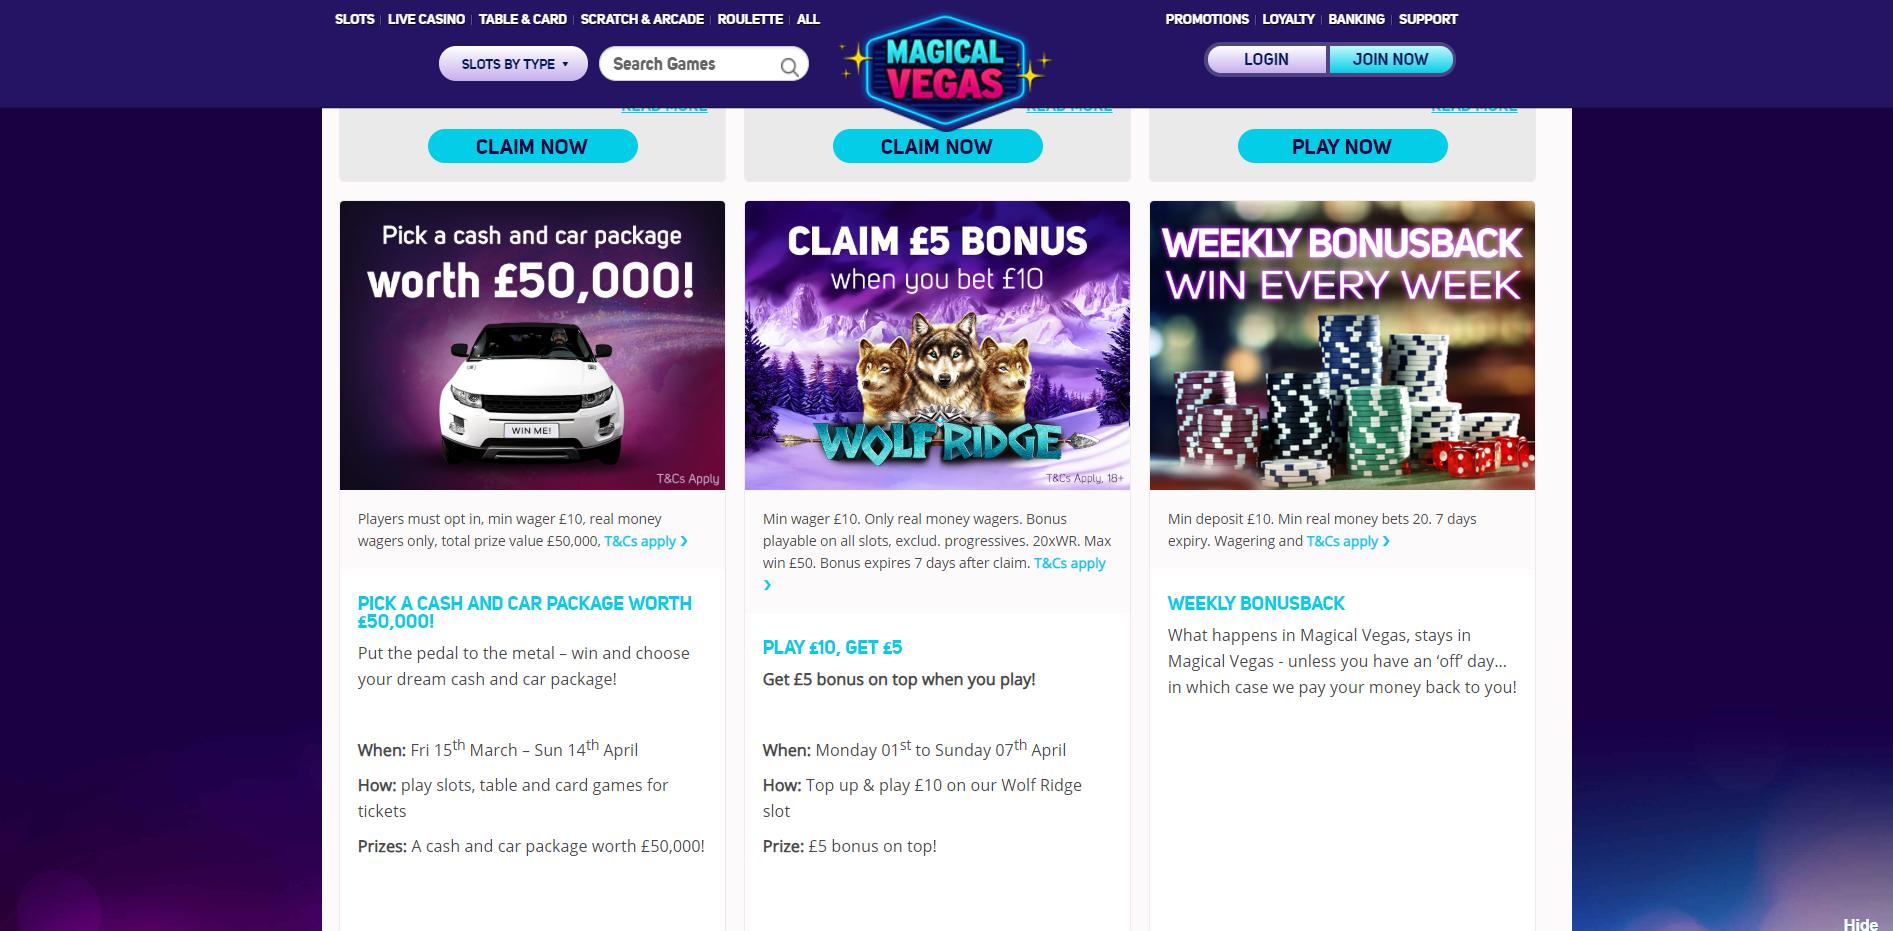 Magical Vegas Casino Bonuses